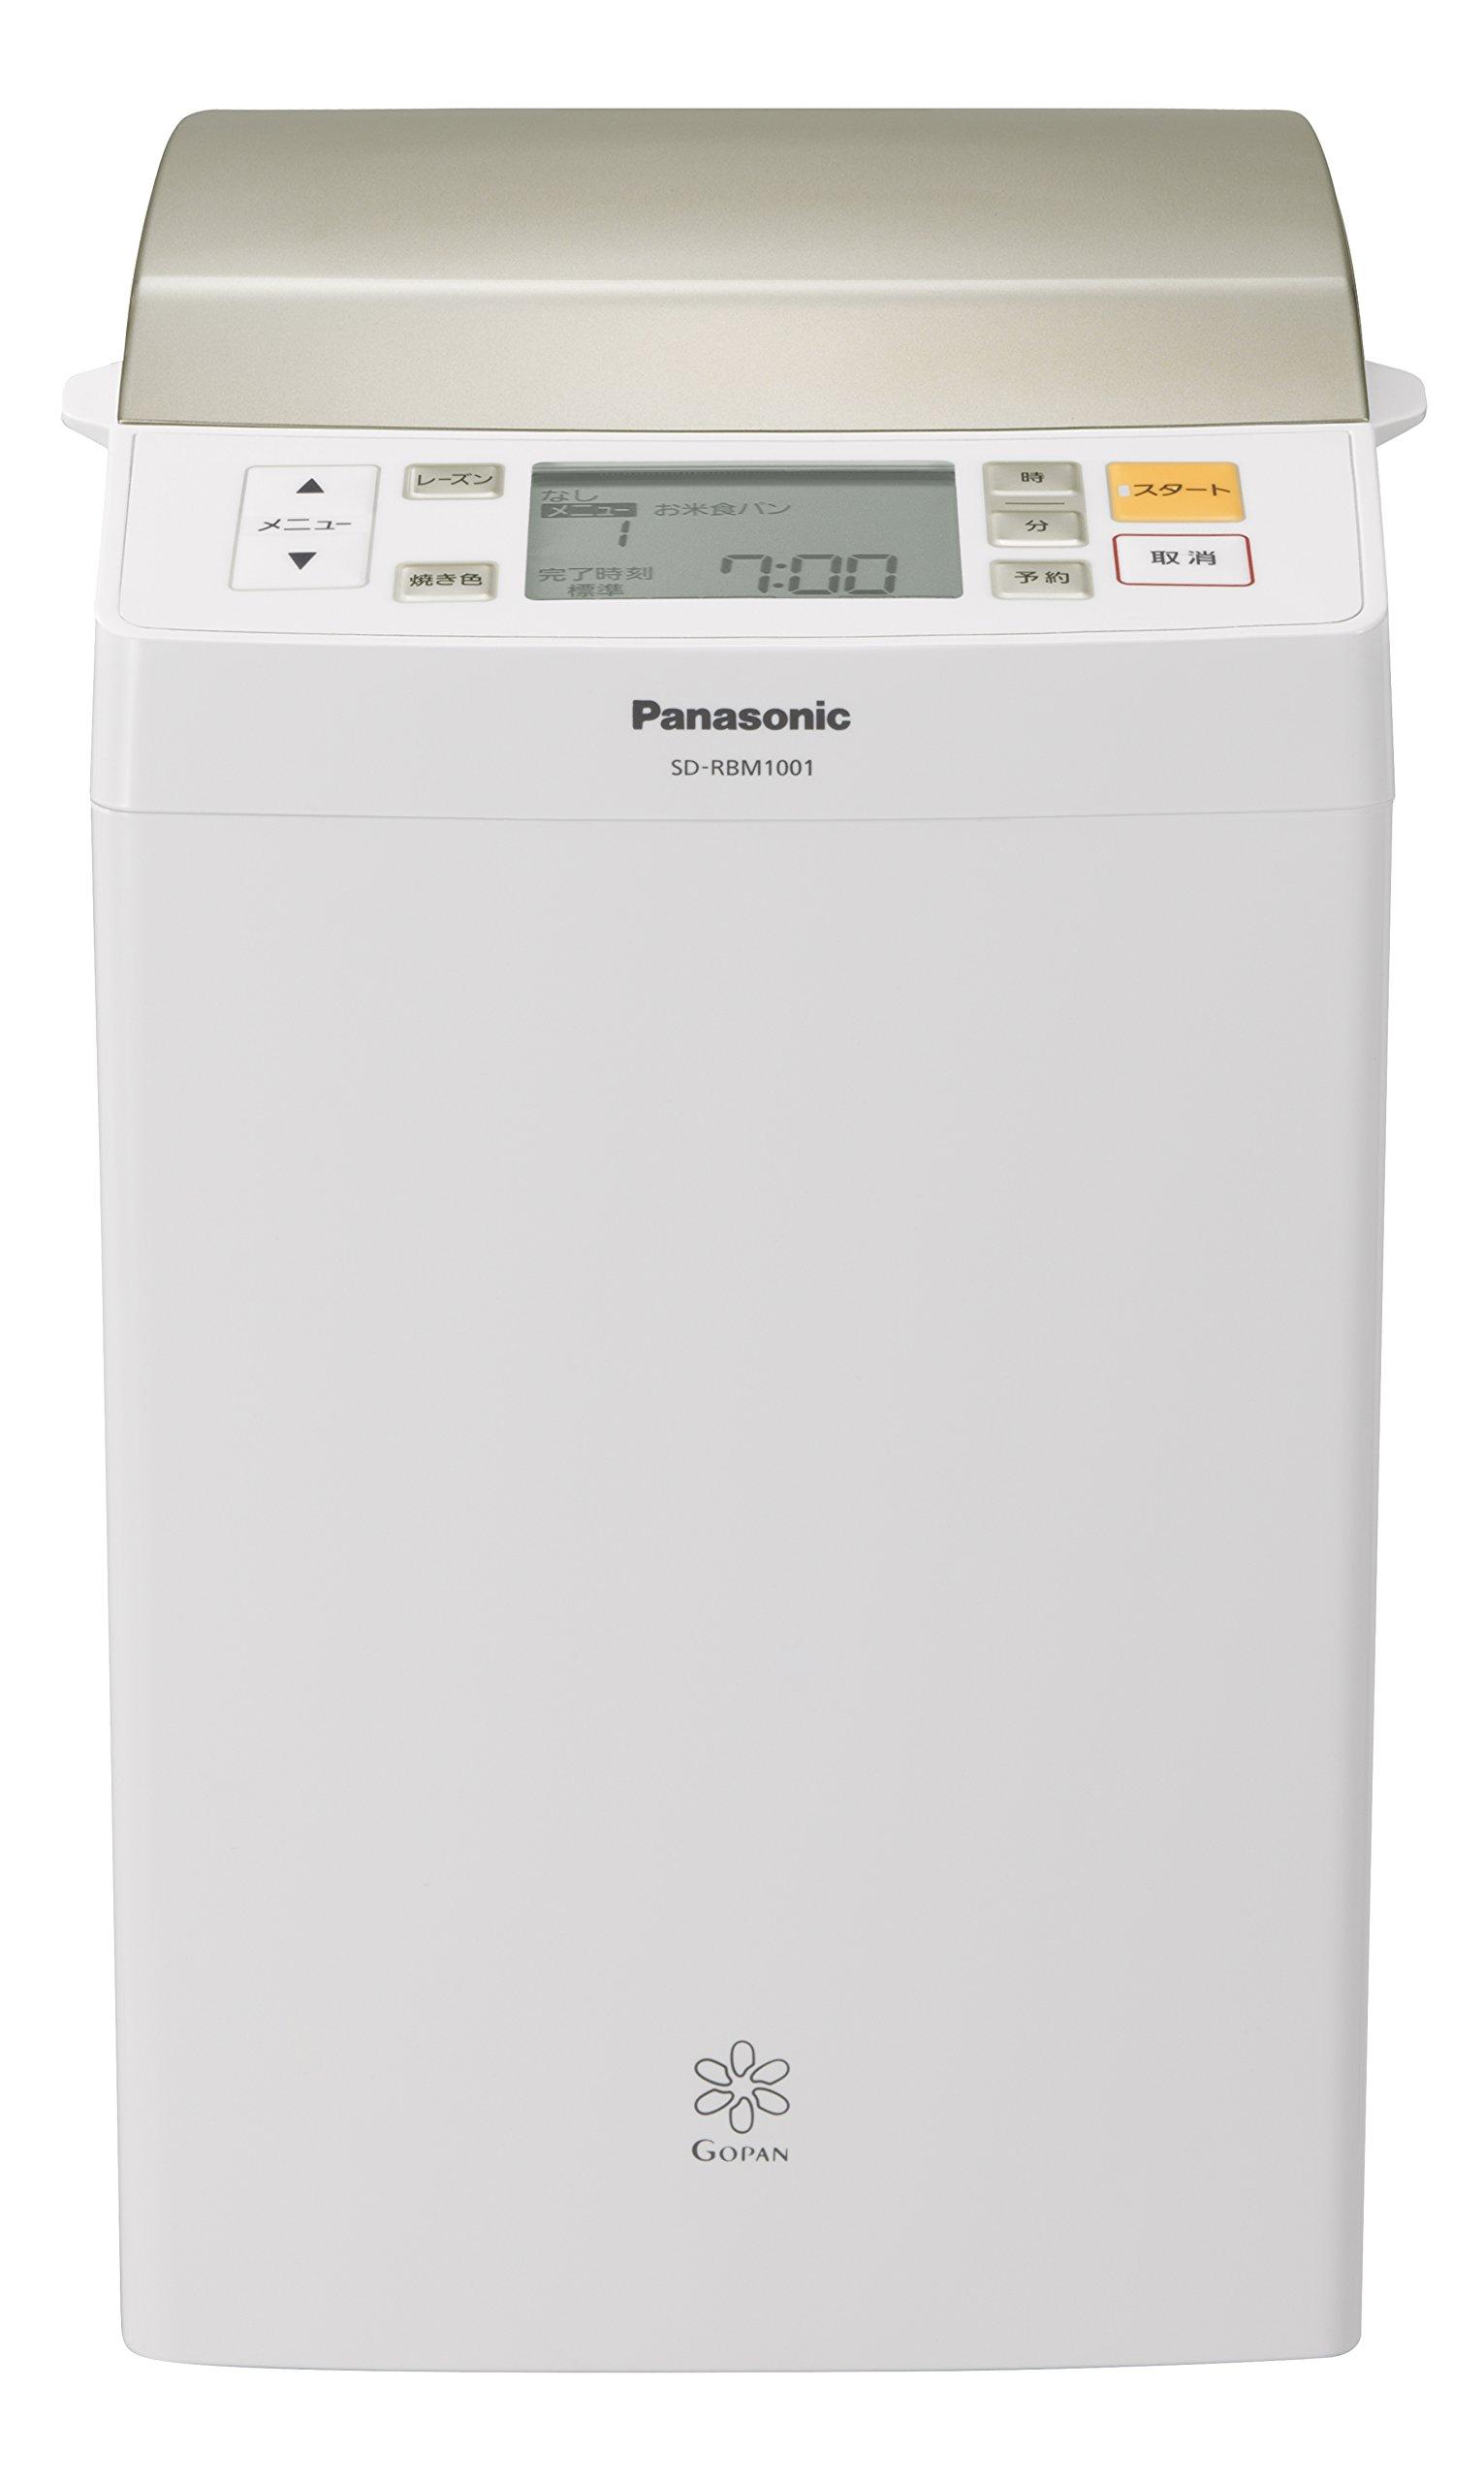 Panasonic New Gopan Rice Bread Cooker White Sd-rbm1001-w(Japan Import-No Warranty)